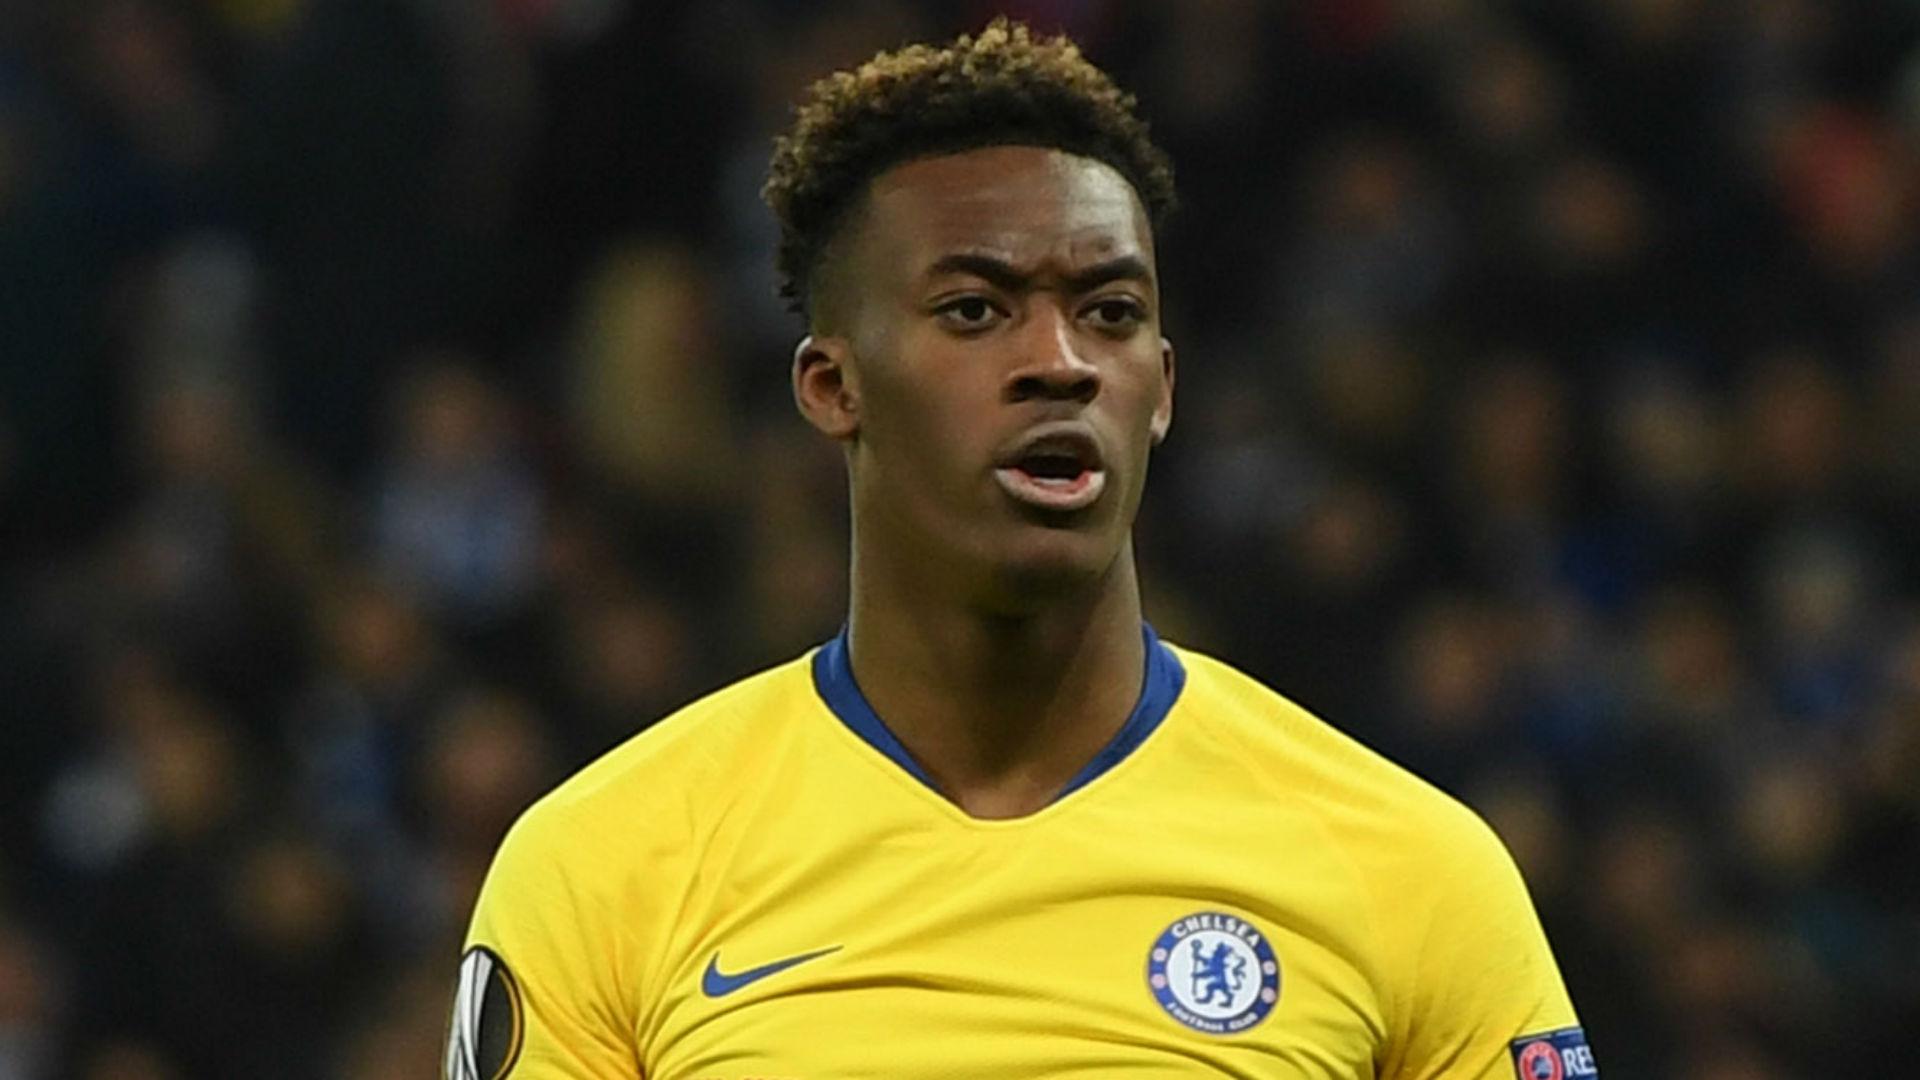 UEFA to investigate Dynamo Kiev over alleged racist abuse of Hudson-Odoi